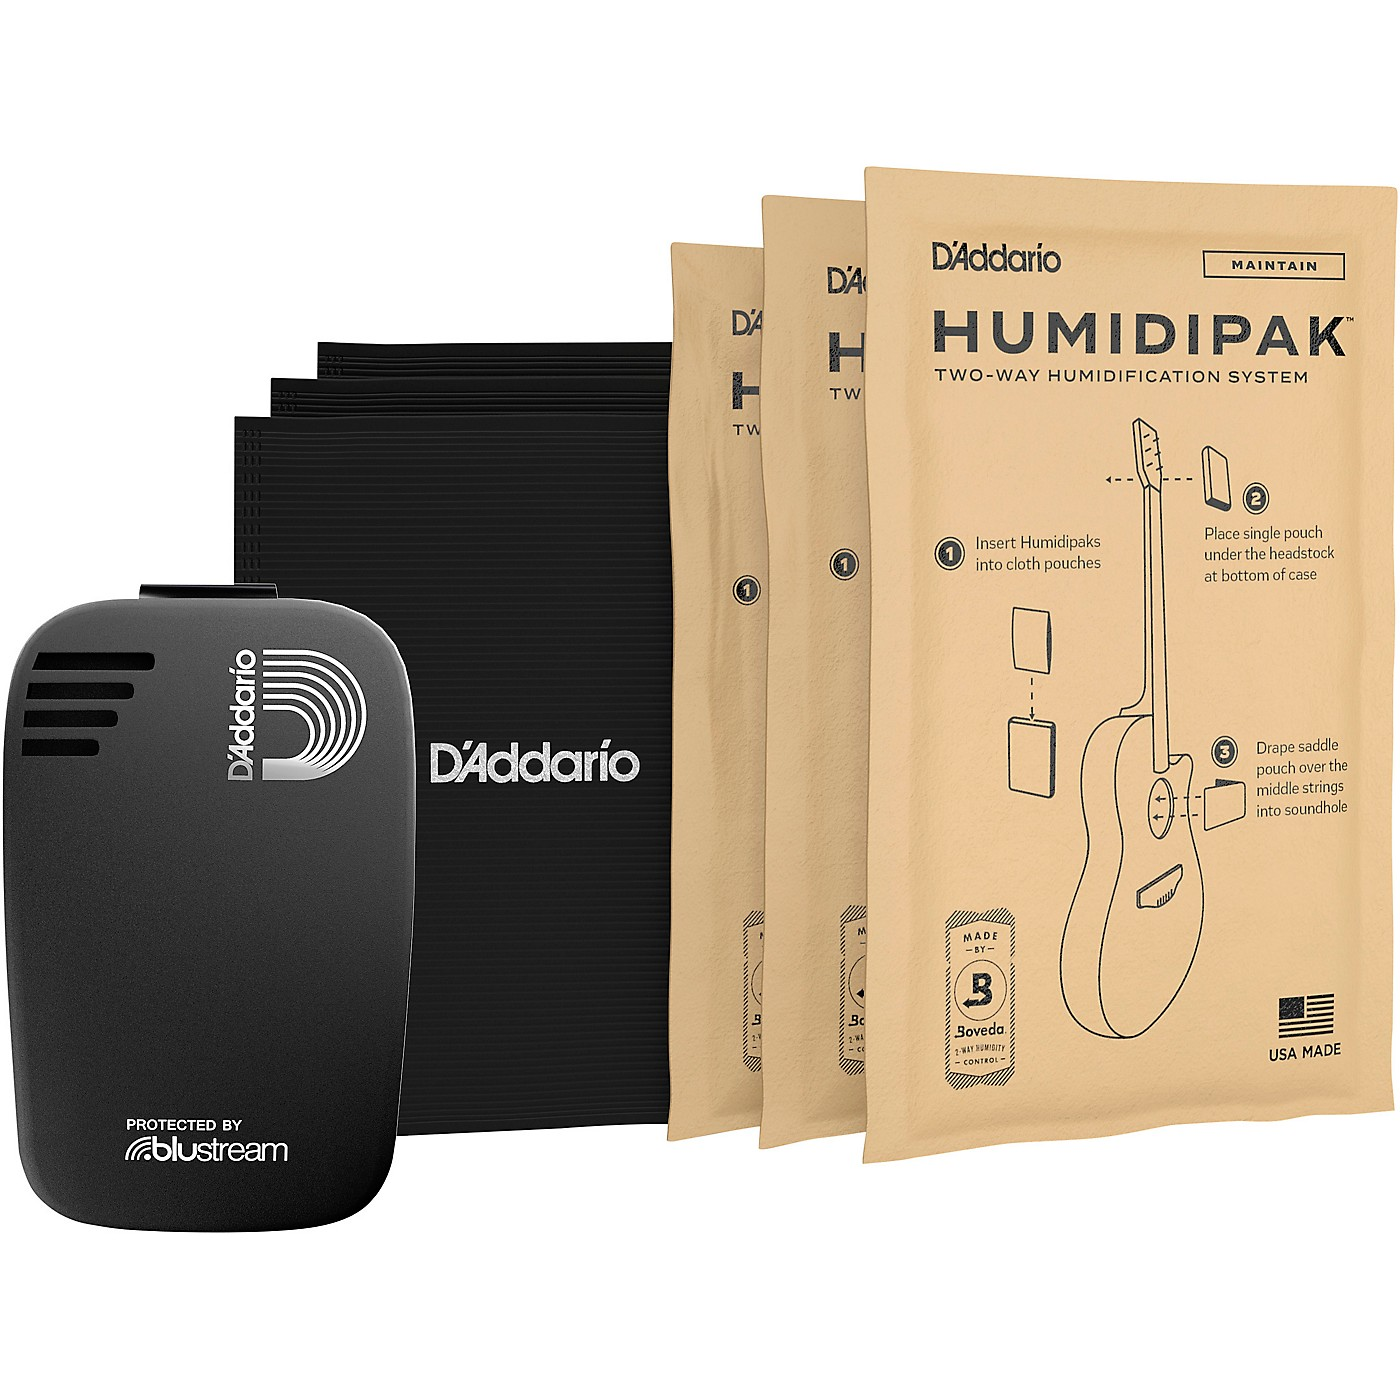 D'Addario Planet Waves Humidikit - Humiditrak / Humidipak Bundle thumbnail